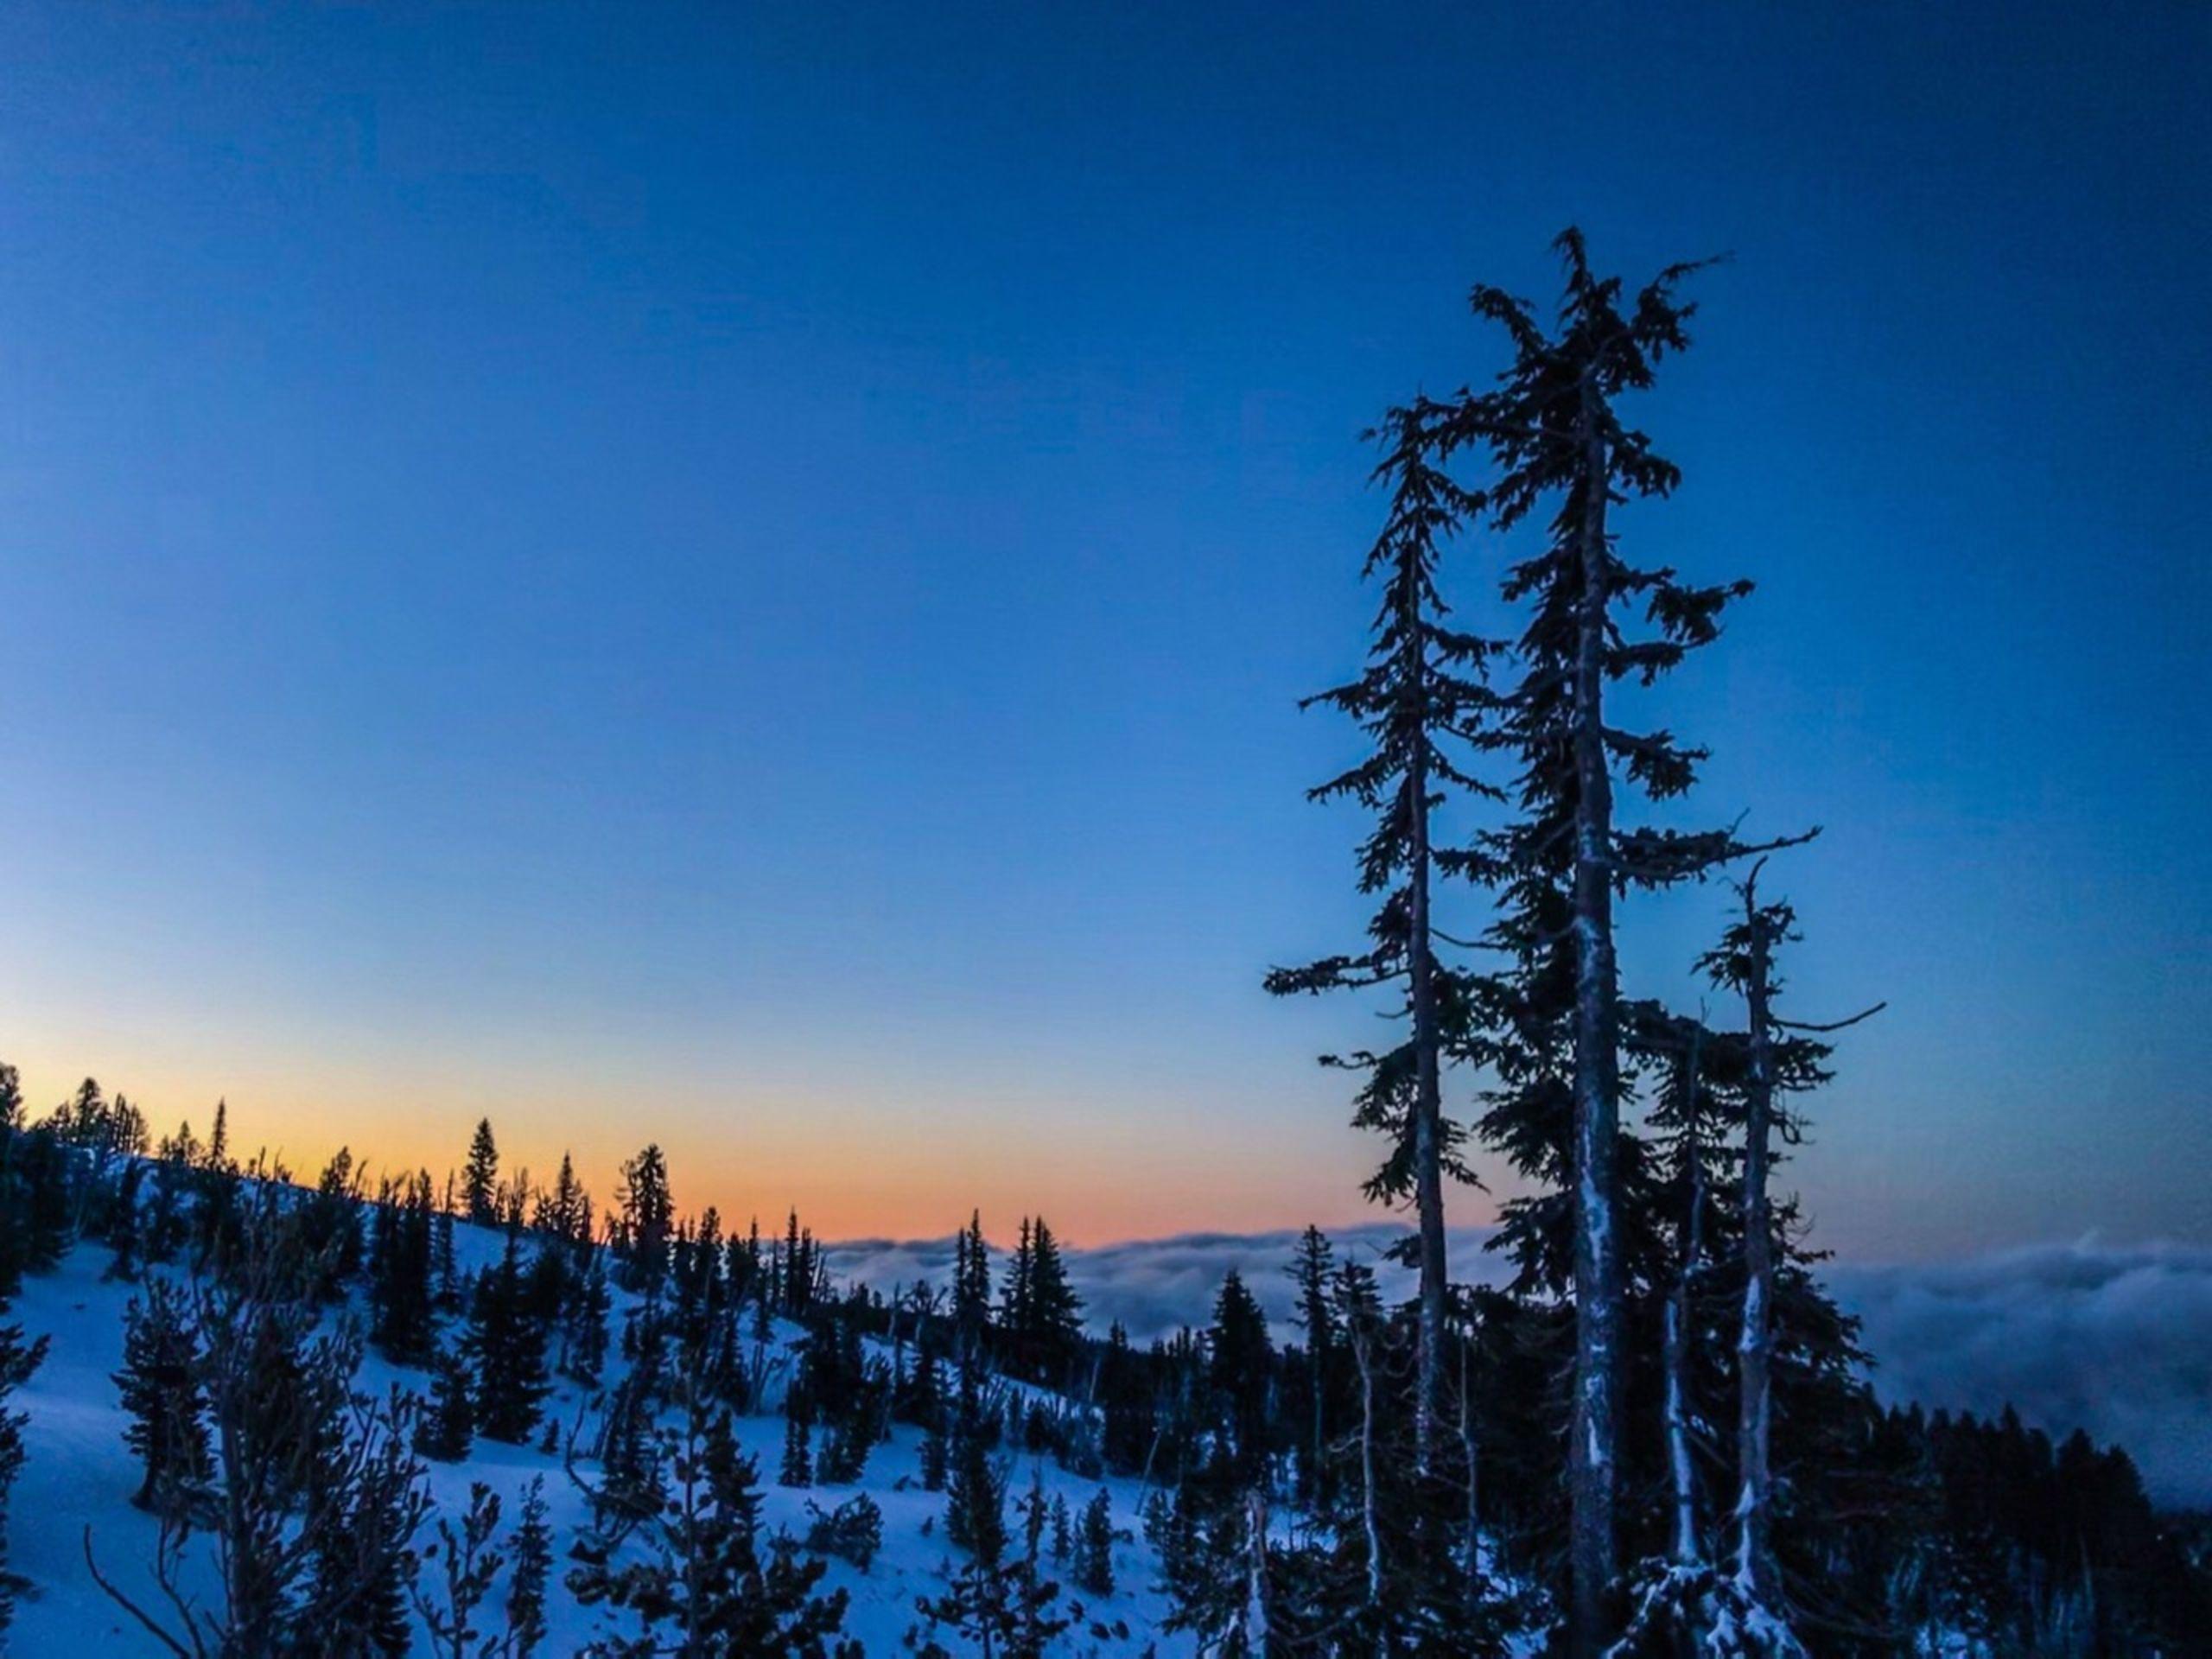 Sunrise from Mt Hood, Oregon